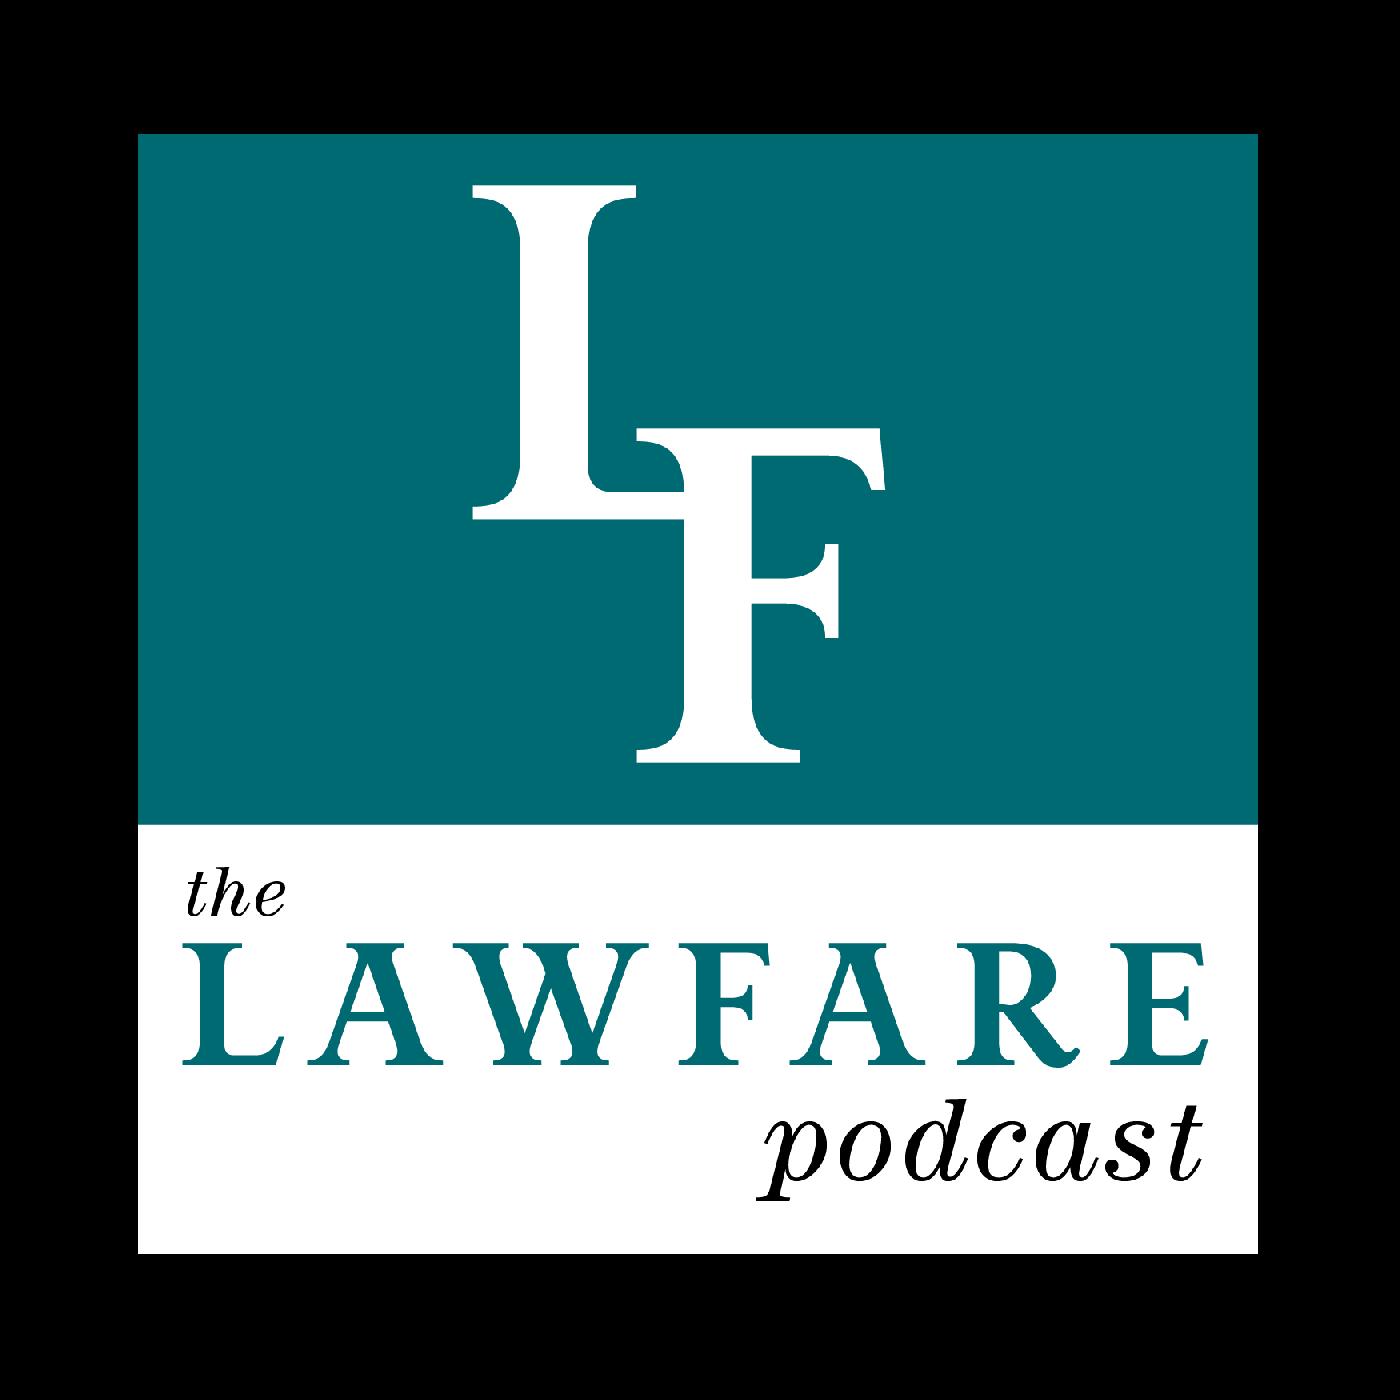 The Lawfare Podcast show art